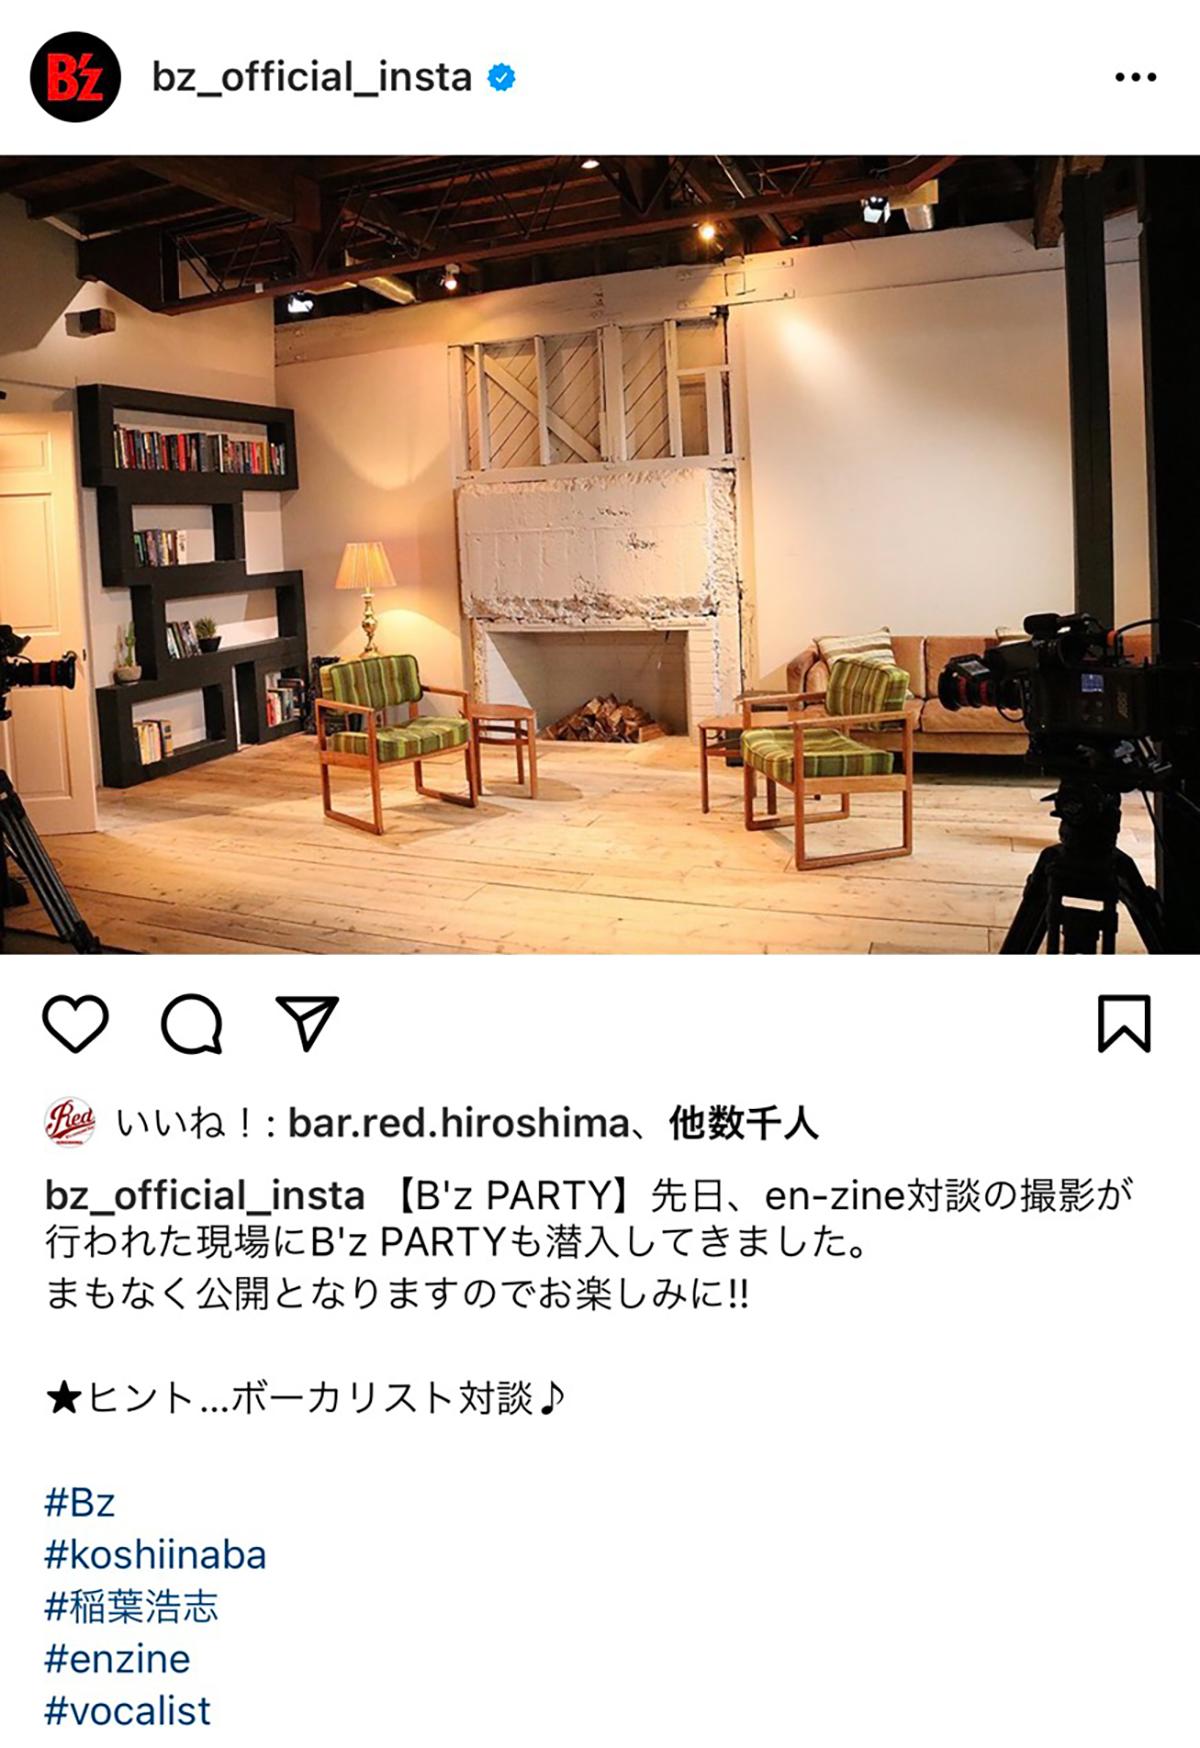 B'z公式Instagramで投稿された稲葉浩志「en-zine」対談企画の撮影現場の写真